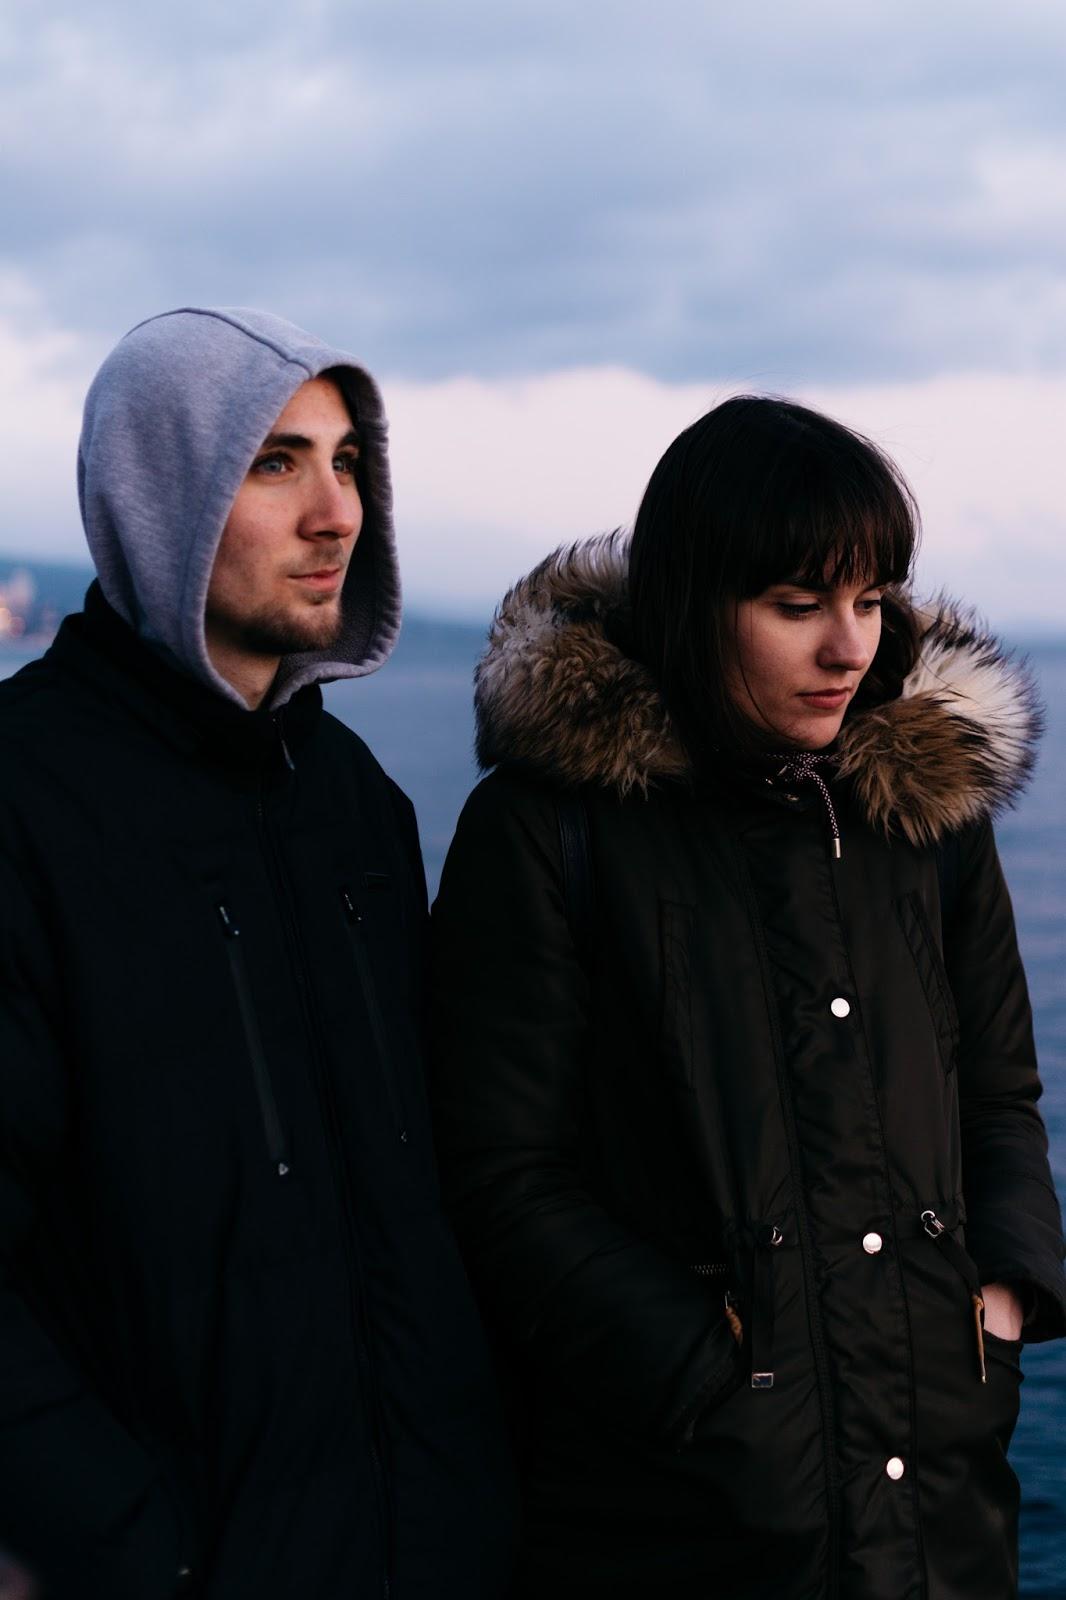 Mladen & Ana  2 by Moonshinefaerie